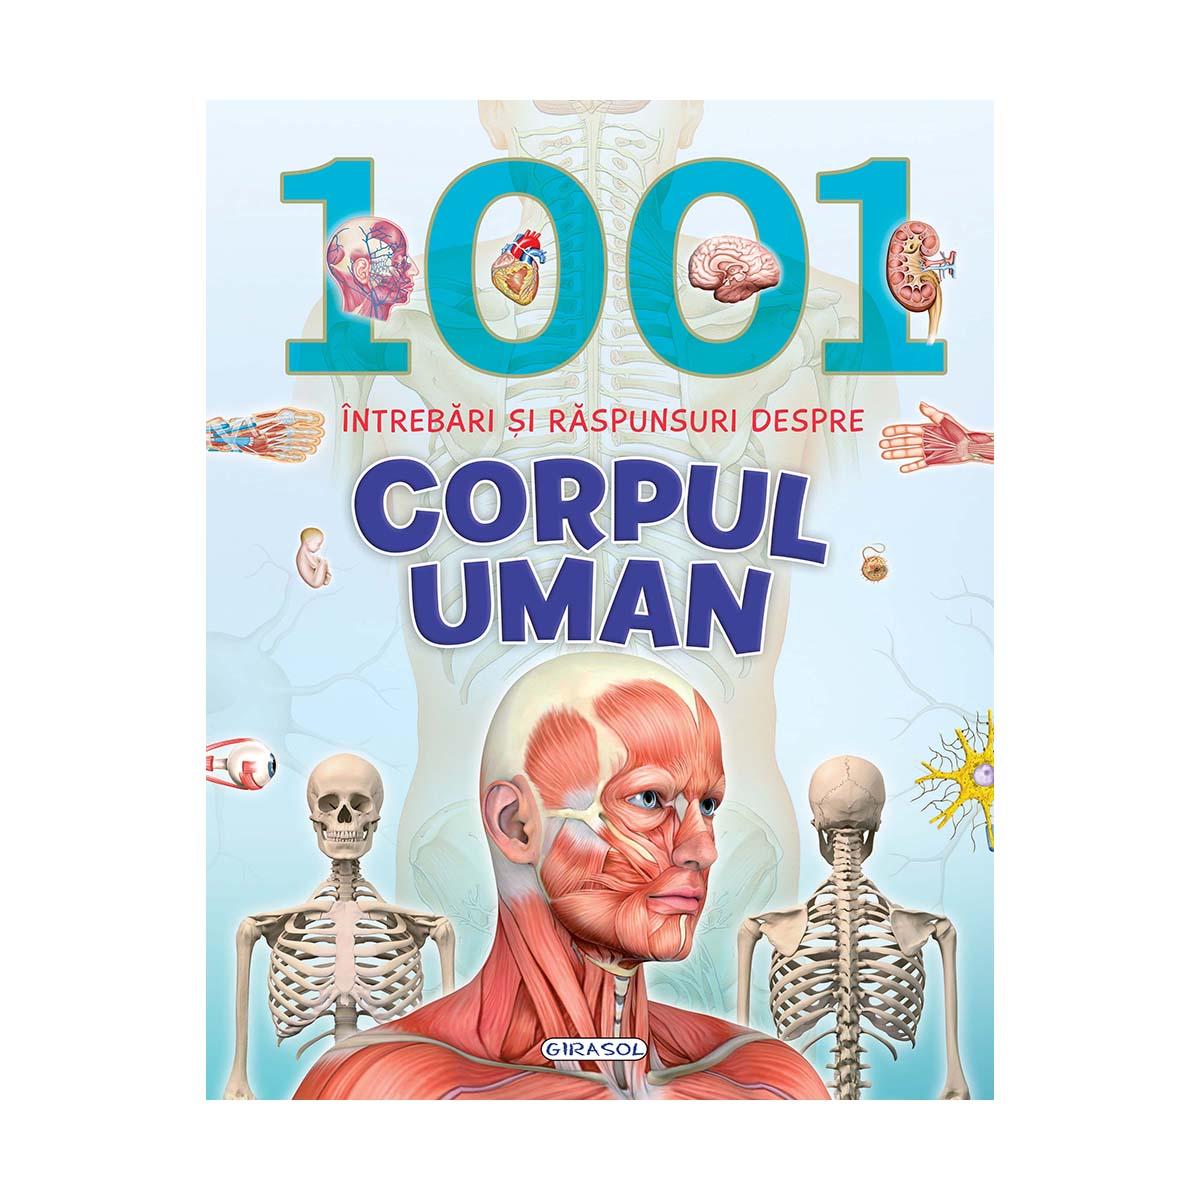 Carte Editura Girasol, 1001 intrebari si raspunsuri despre corpul uman